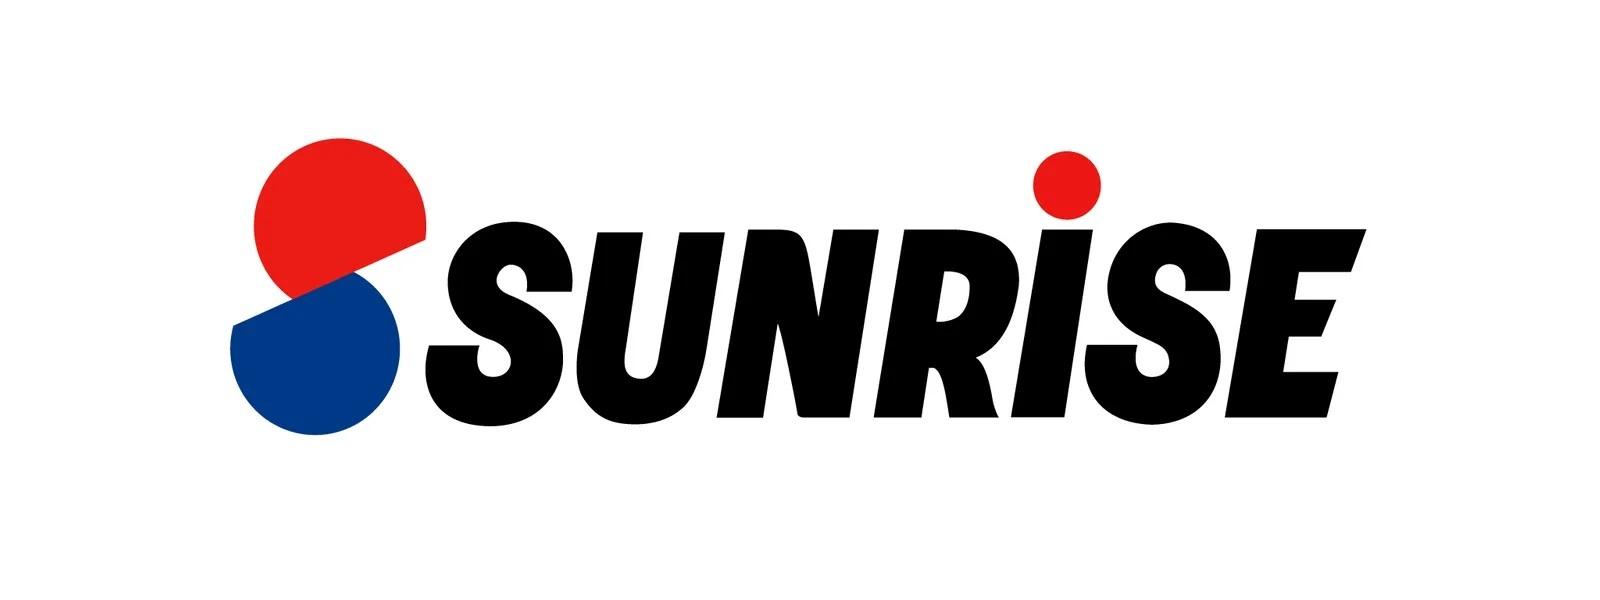 Аниме студии Sunrise